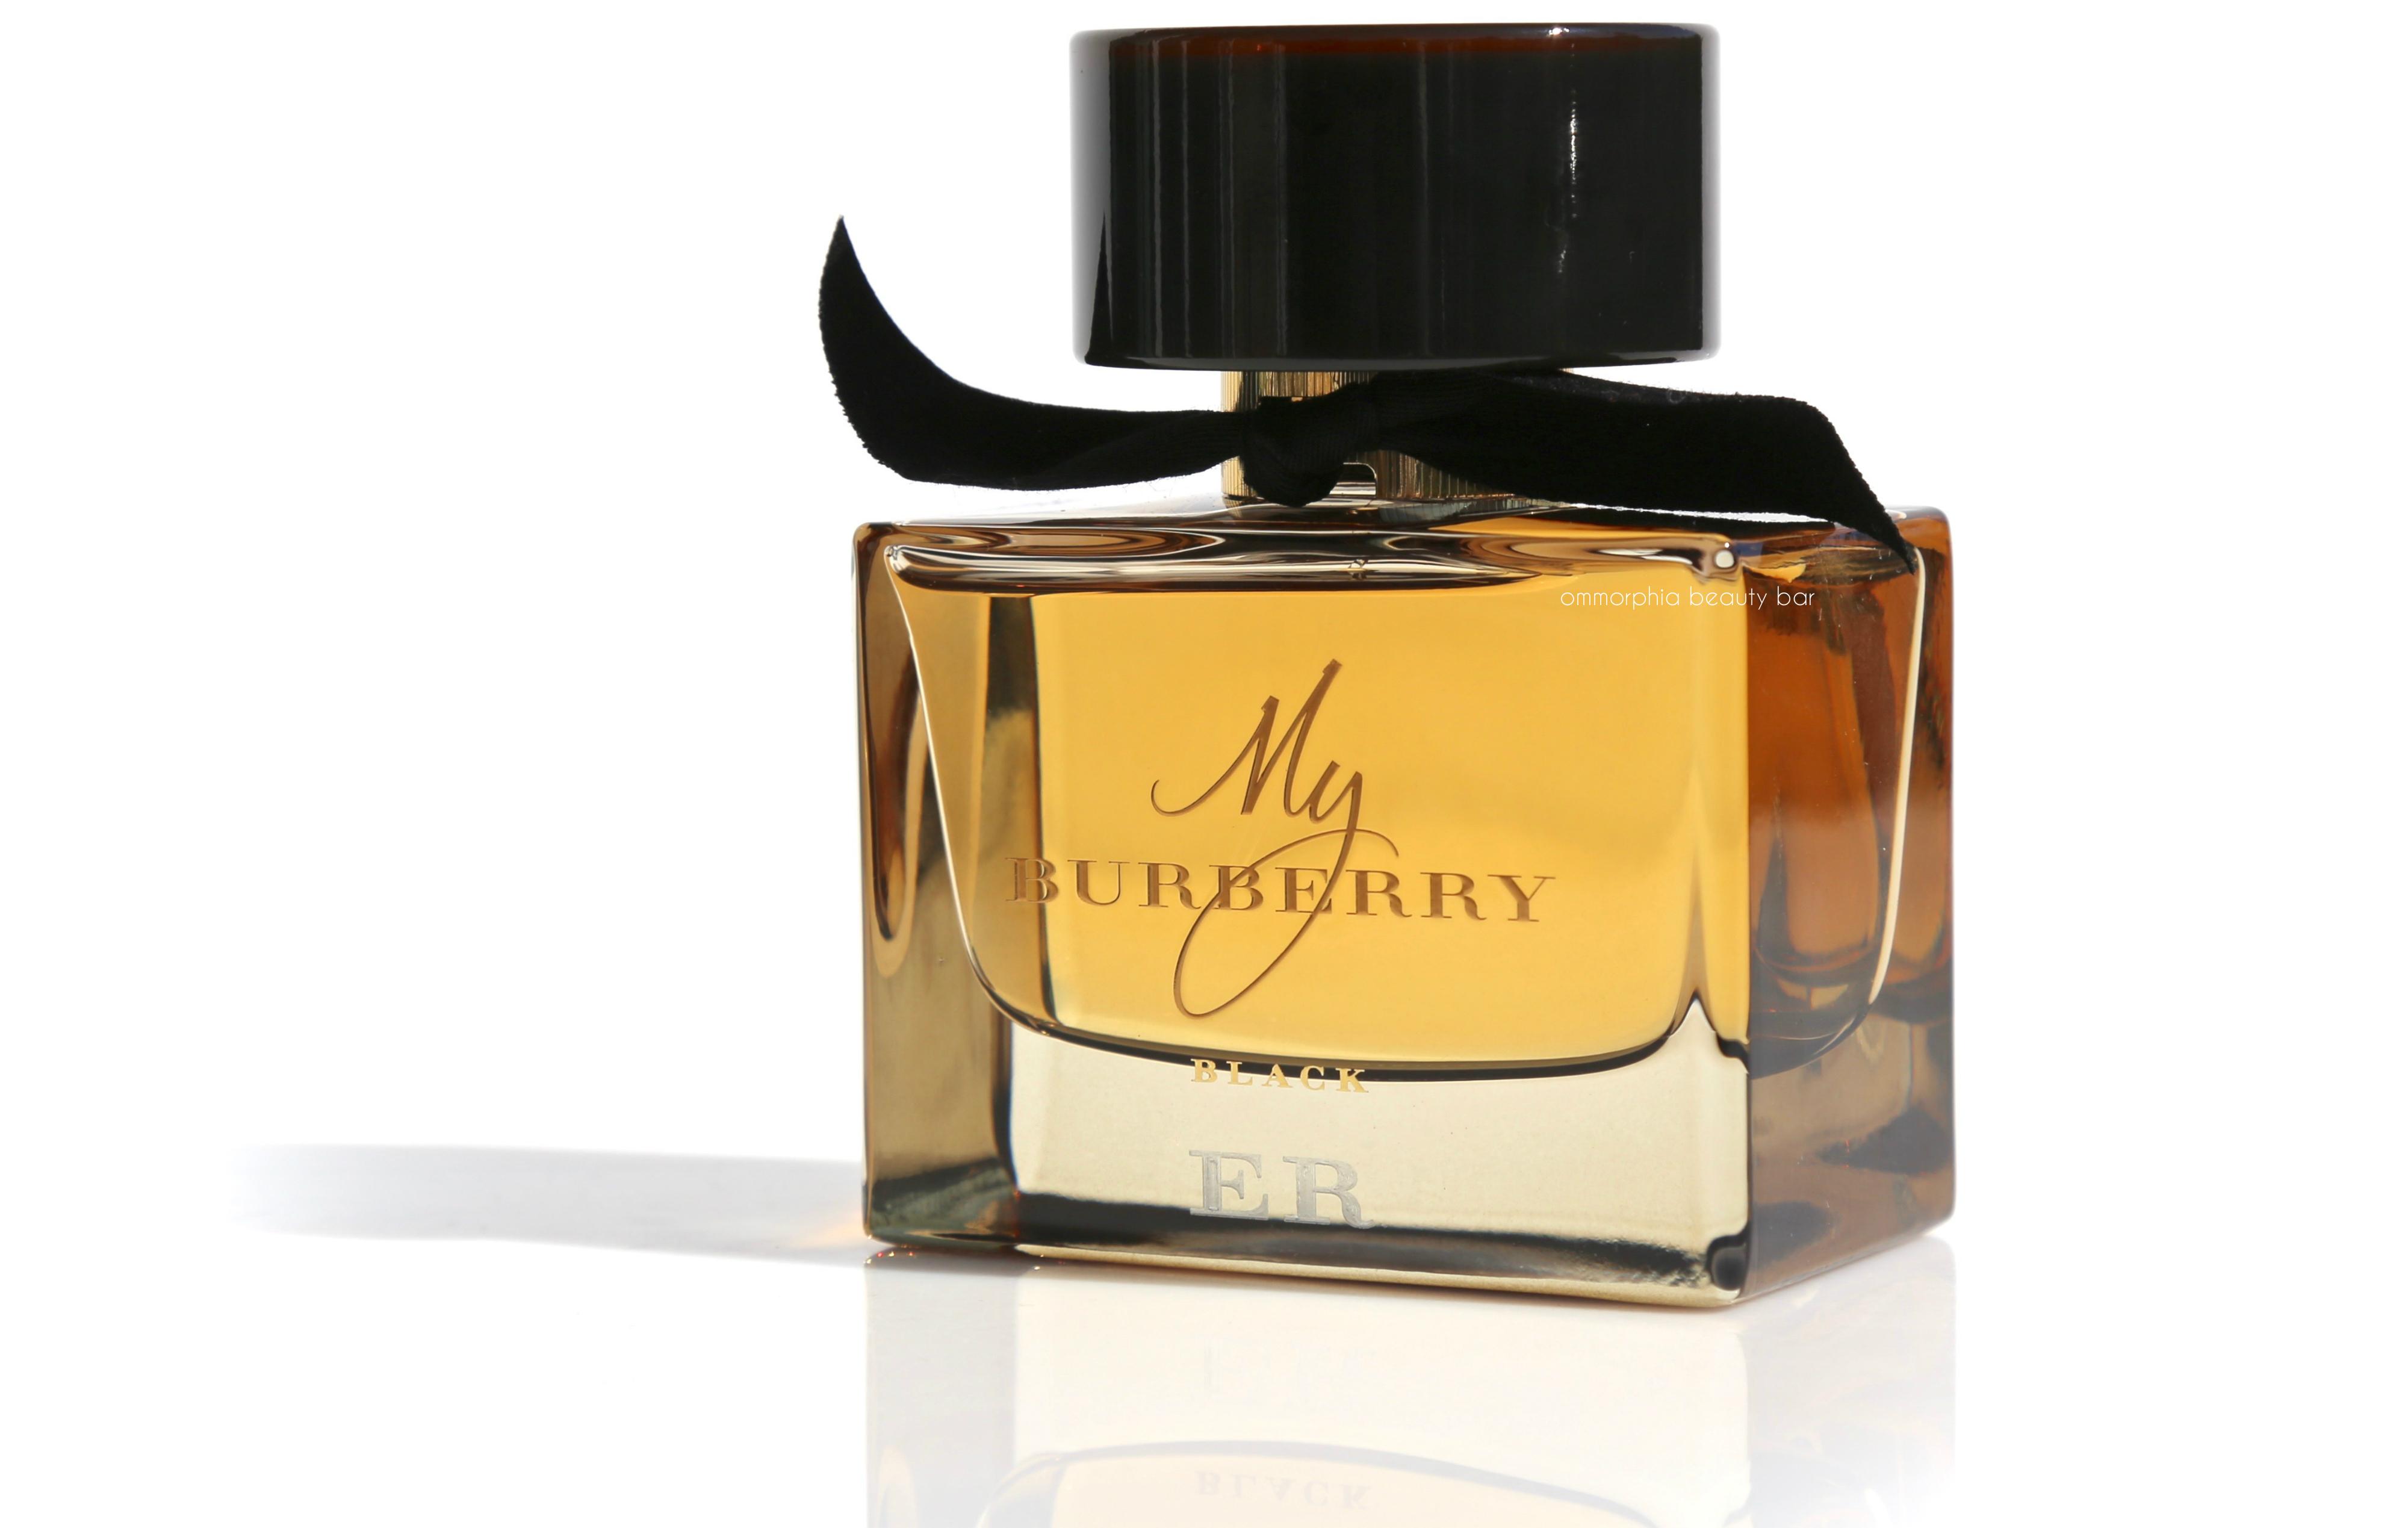 SpotlightMy Beauty Fragrance Burberry Bar BlackOmmorphia wOTPkXuZi